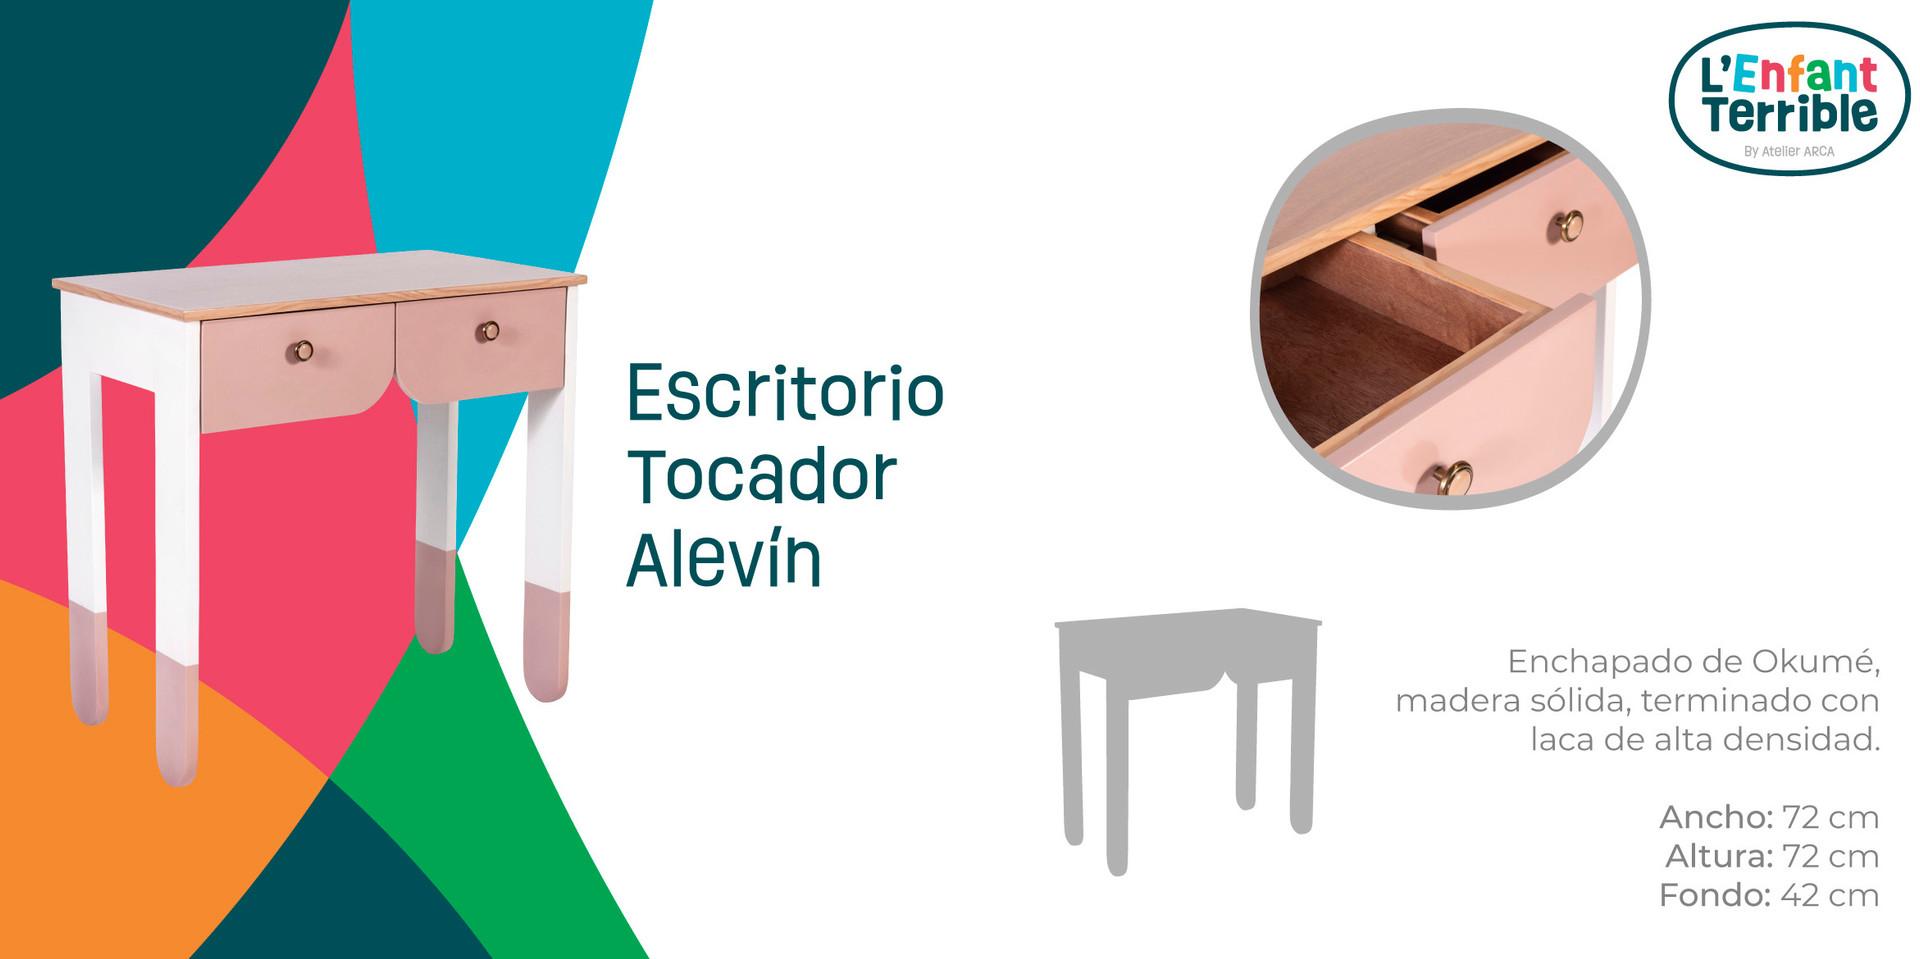 Escritorio - Tocador Alevín